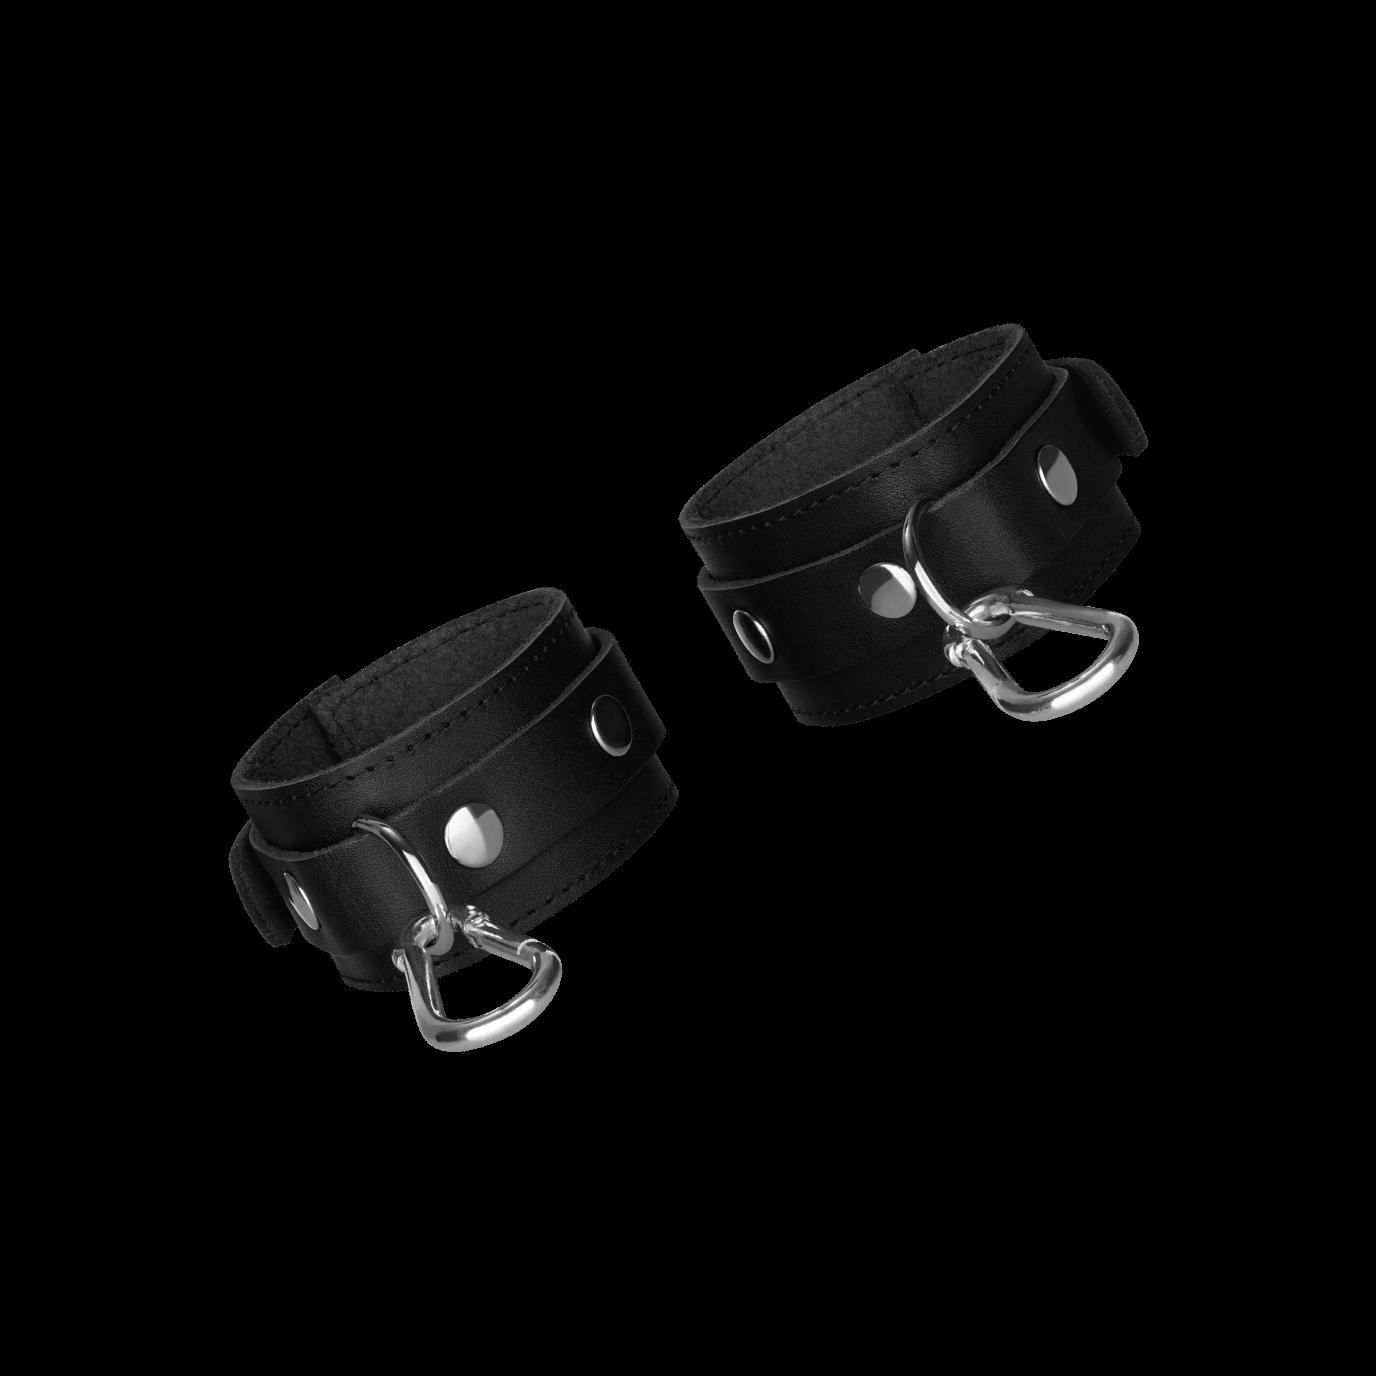 Rimba Leder-Handfesseln, schwarz jetztbilligerkaufen